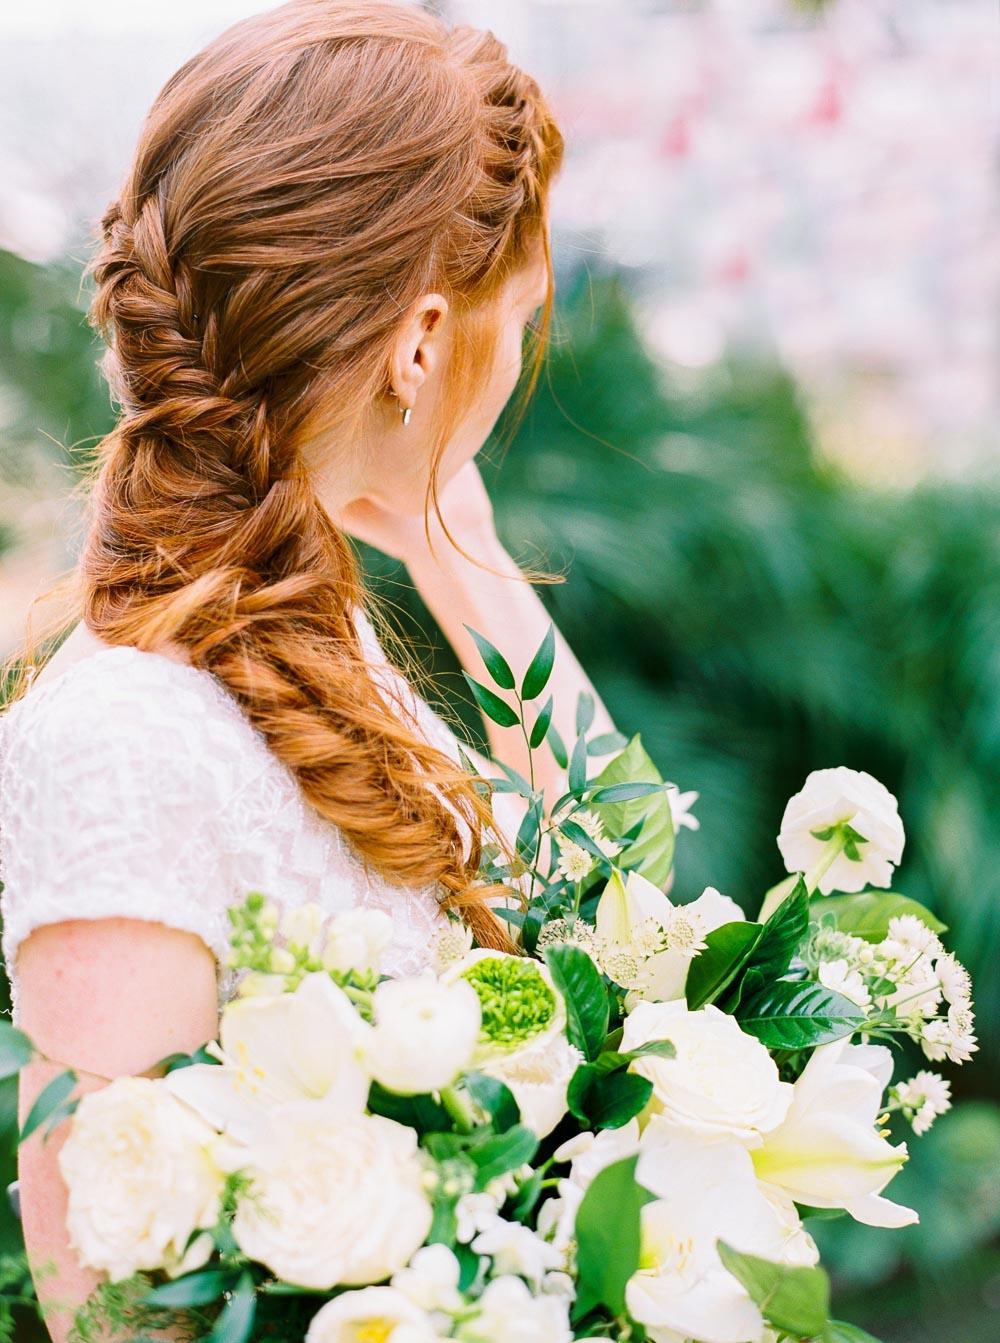 Danielle Poff Photography http://www.daniellepoff.com